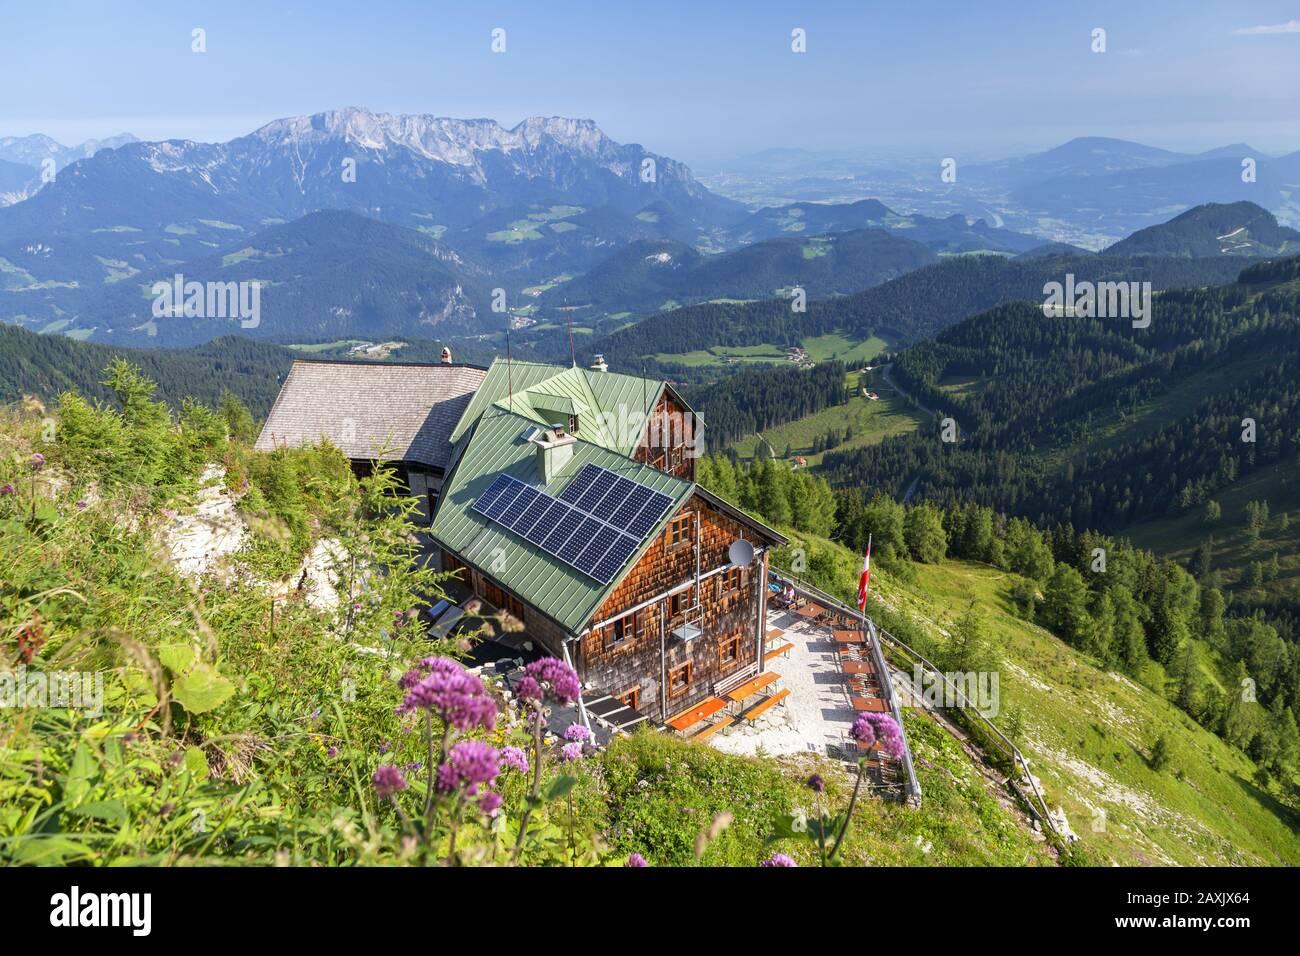 Purtschellerhaus on the border, Untersberg (1,973 m) behind, at Berchtesgaden, Berchtesgadener Land, Upper Bavaria, Bavaria, southern Germany, Germany Stock Photo